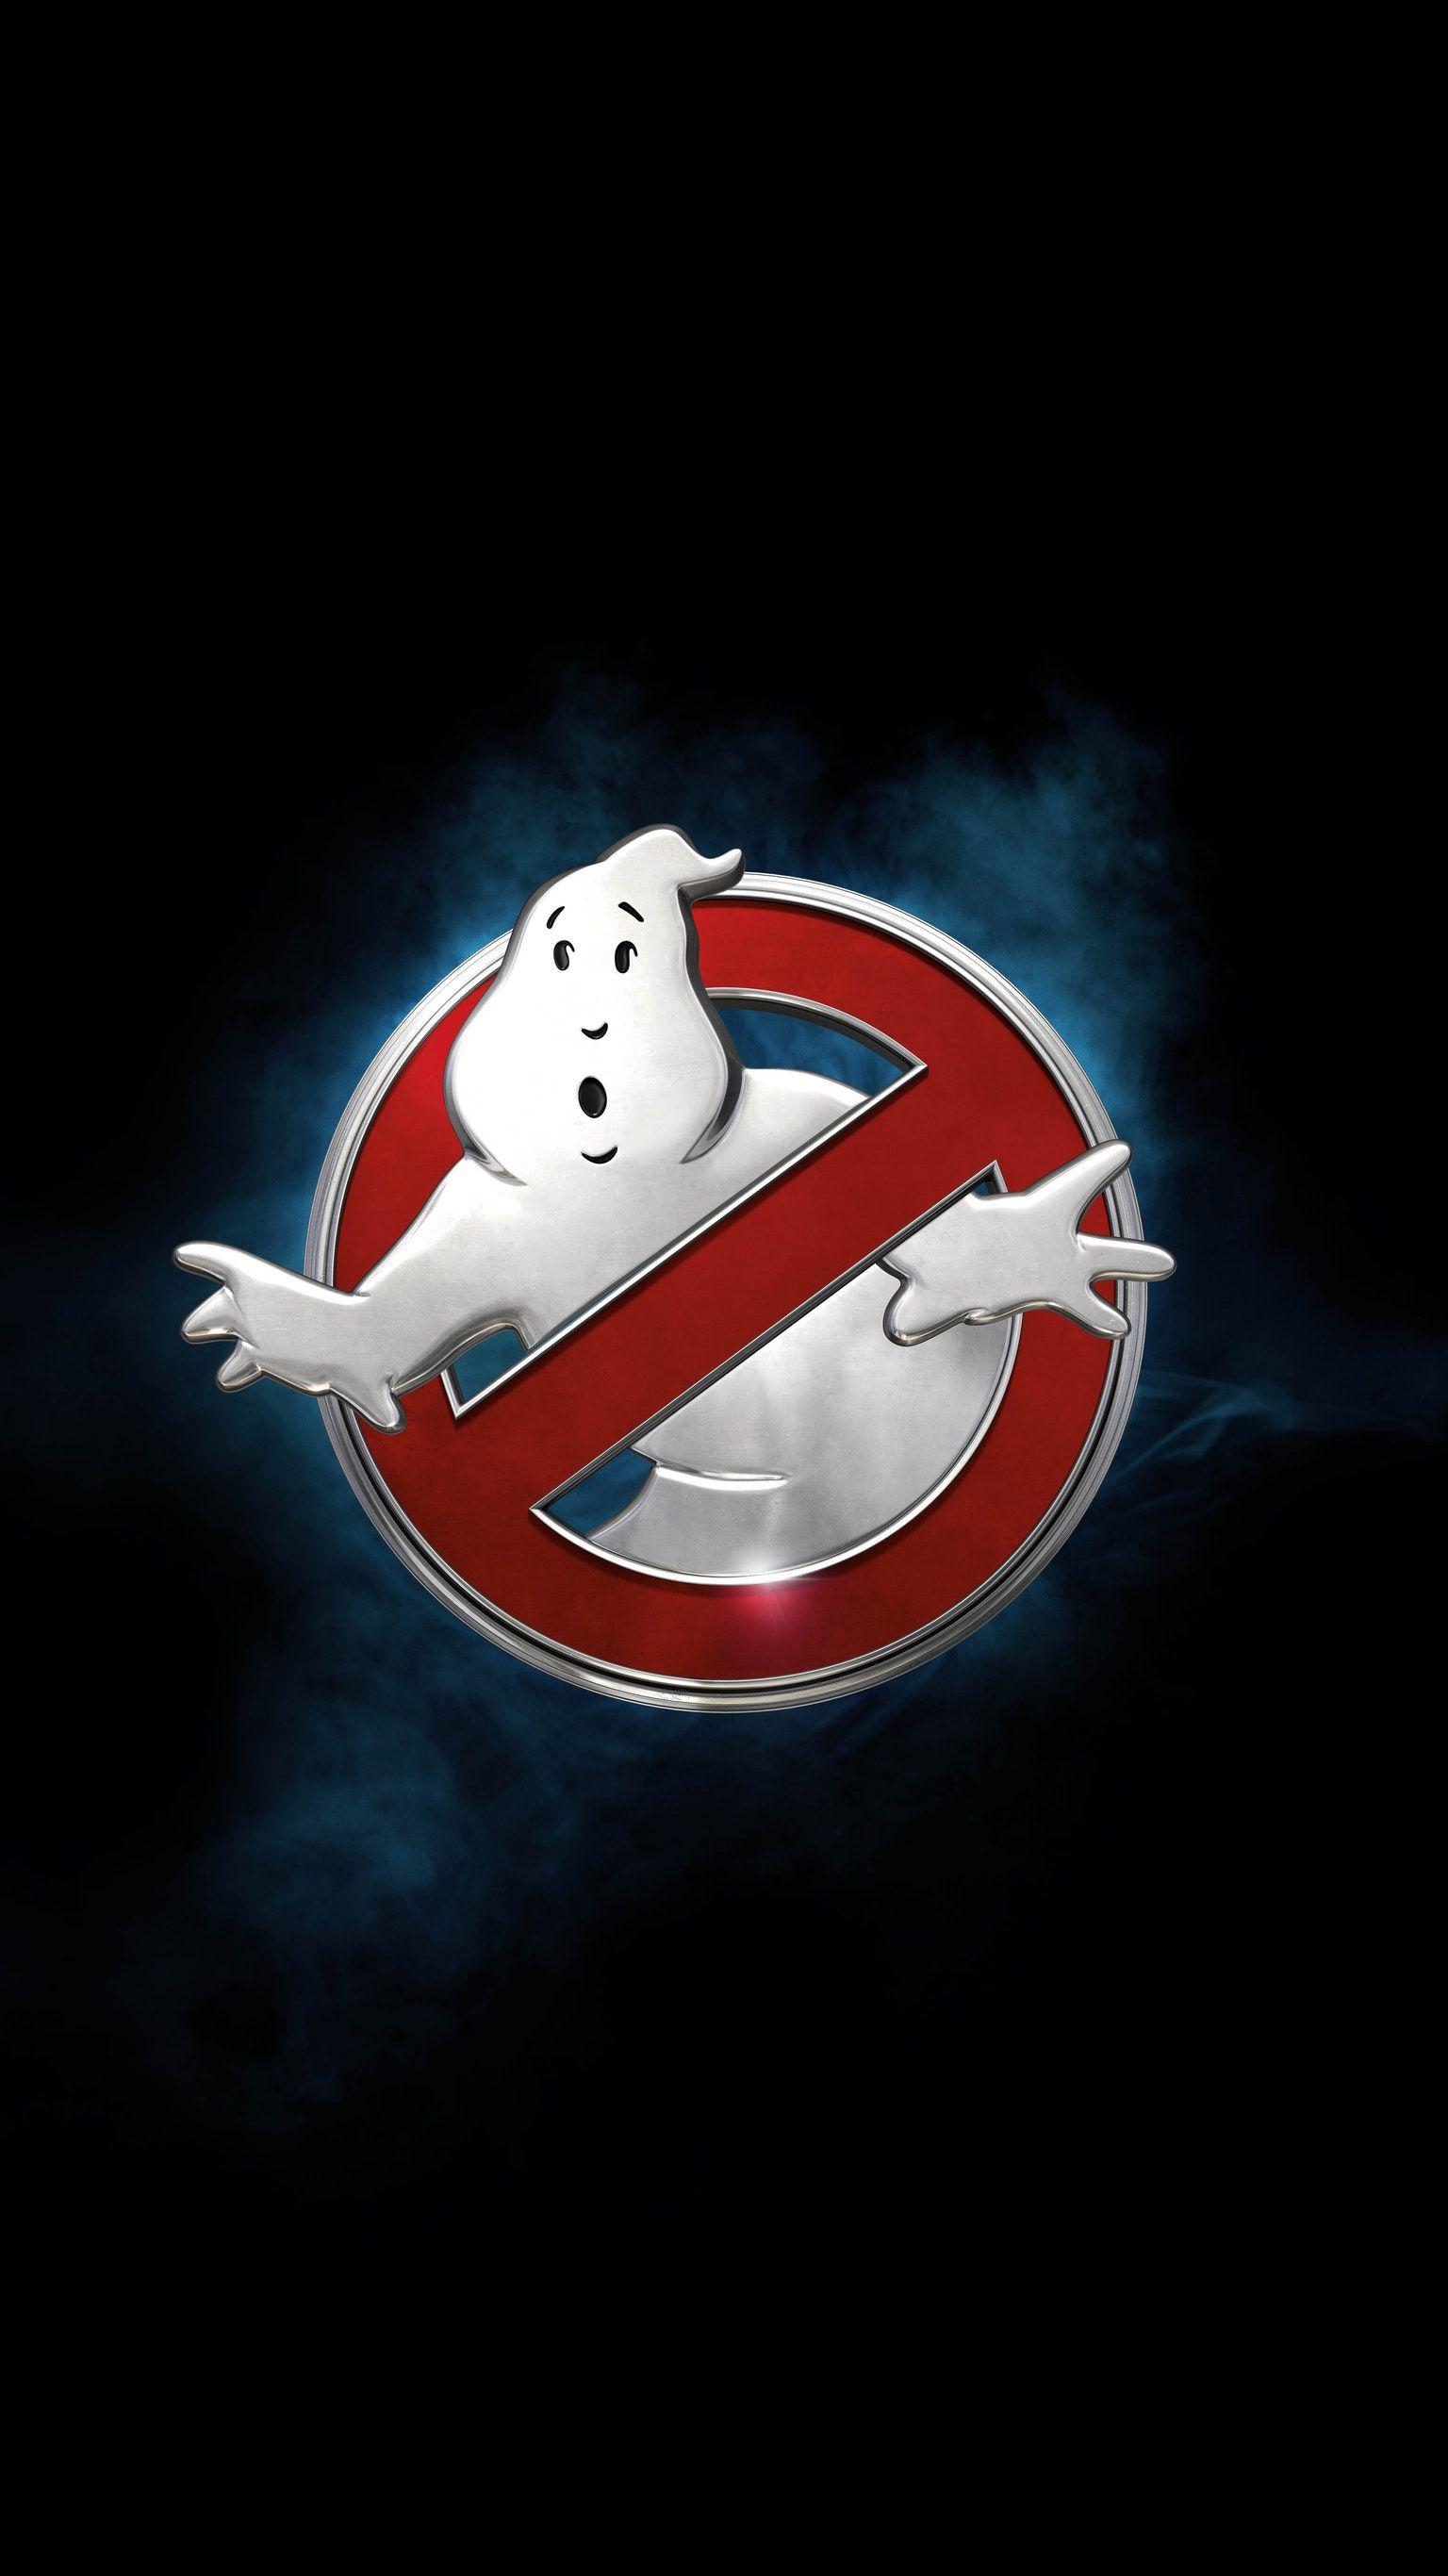 Ghostbusters 2016 Phone Wallpaper Moviemania Cartoon Wallpaper Ghostbusters Logo Ghostbusters